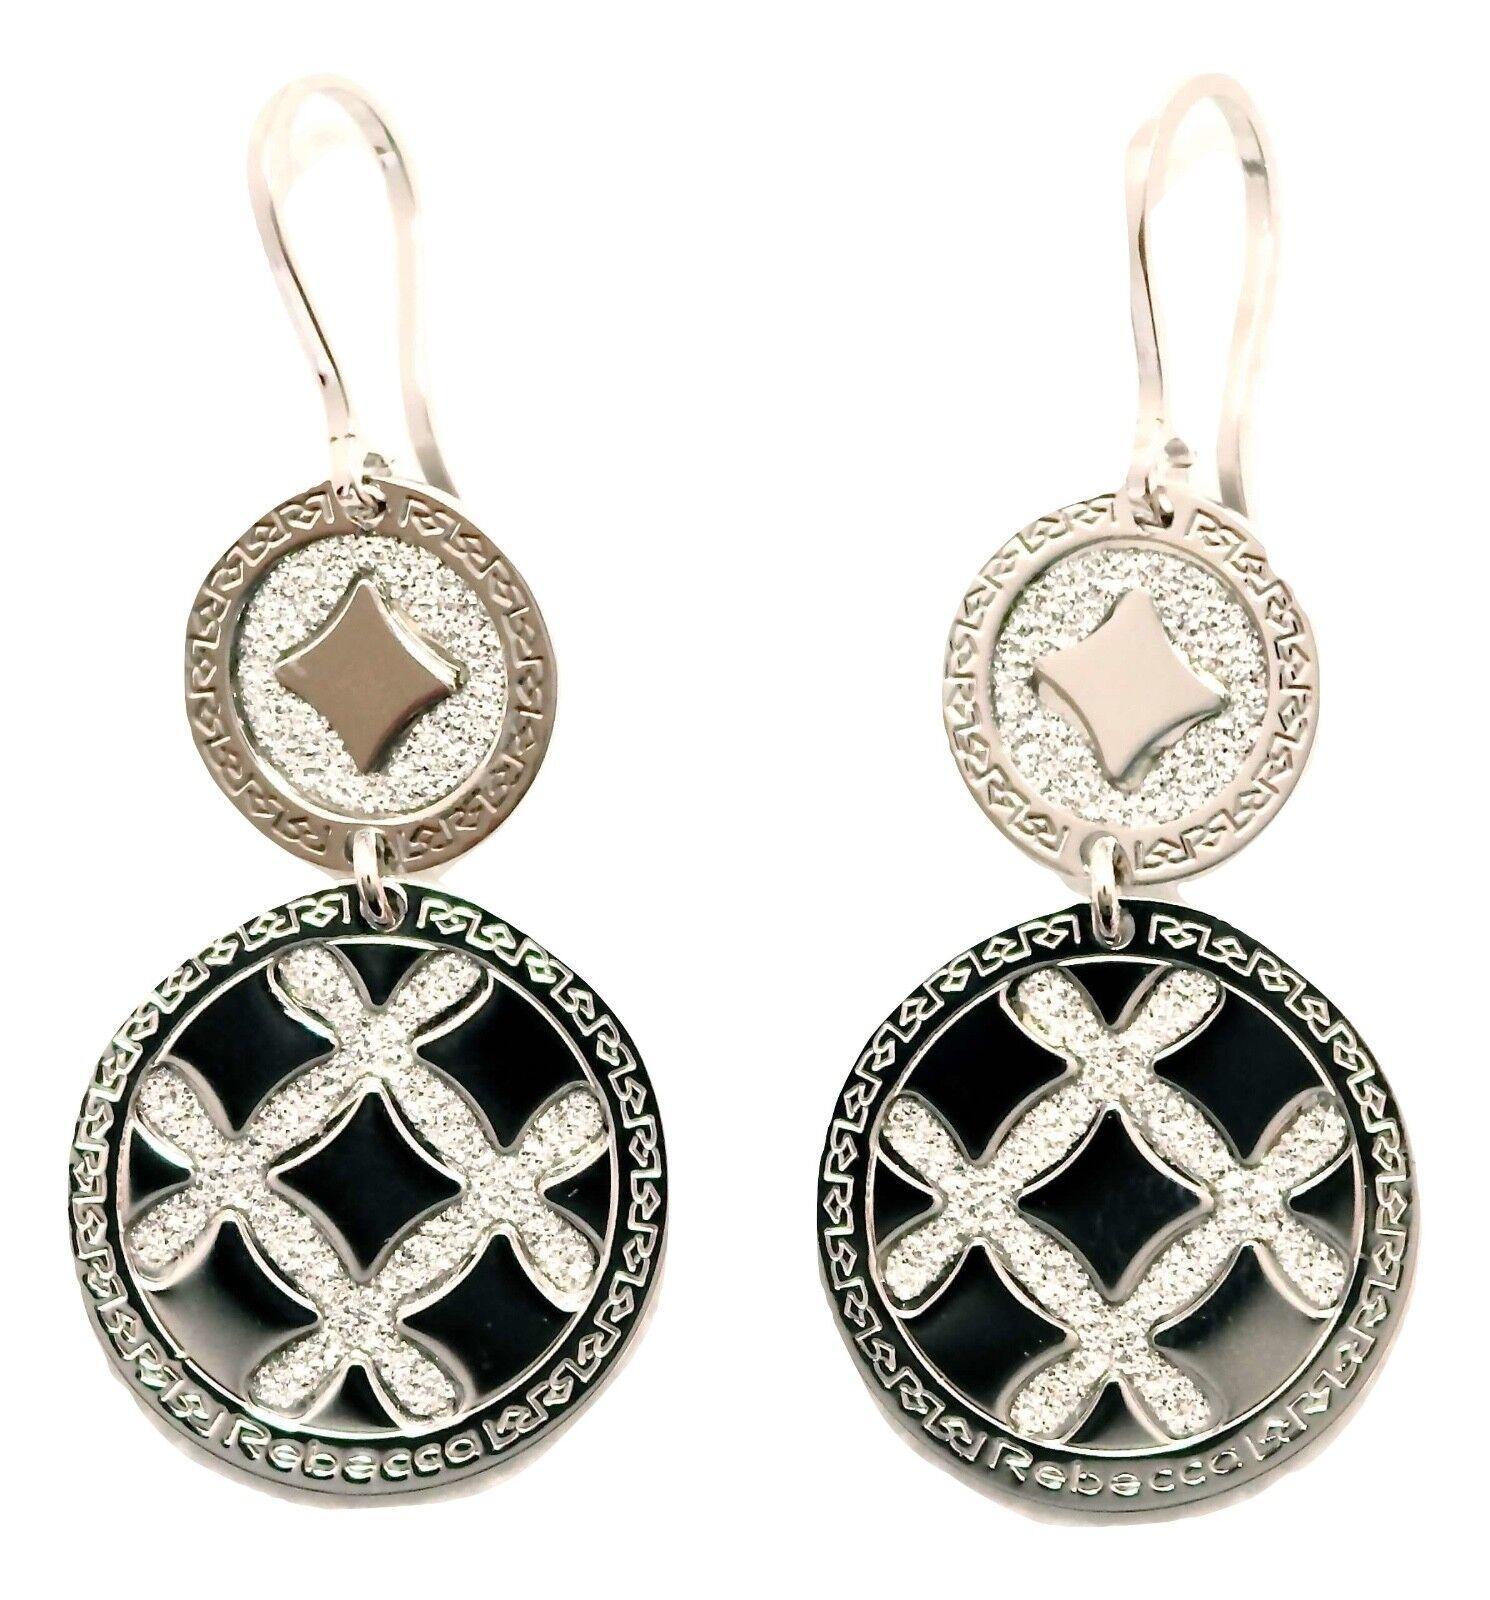 Rebecca Dual Circles Earrings in Stainless Steel